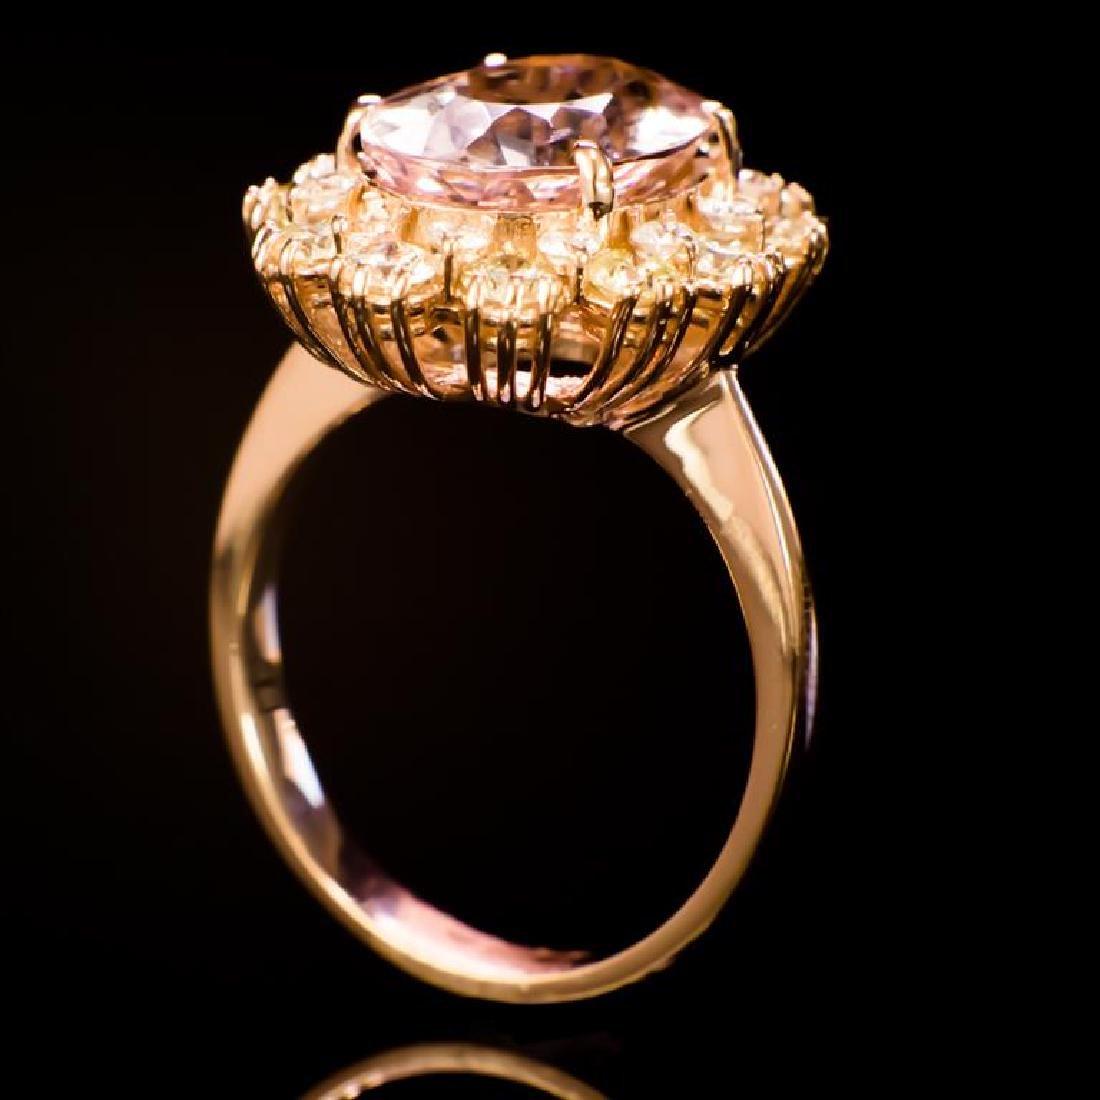 14K Gold 3.53ct Morganite 1.45ct Diamond Ring - 3